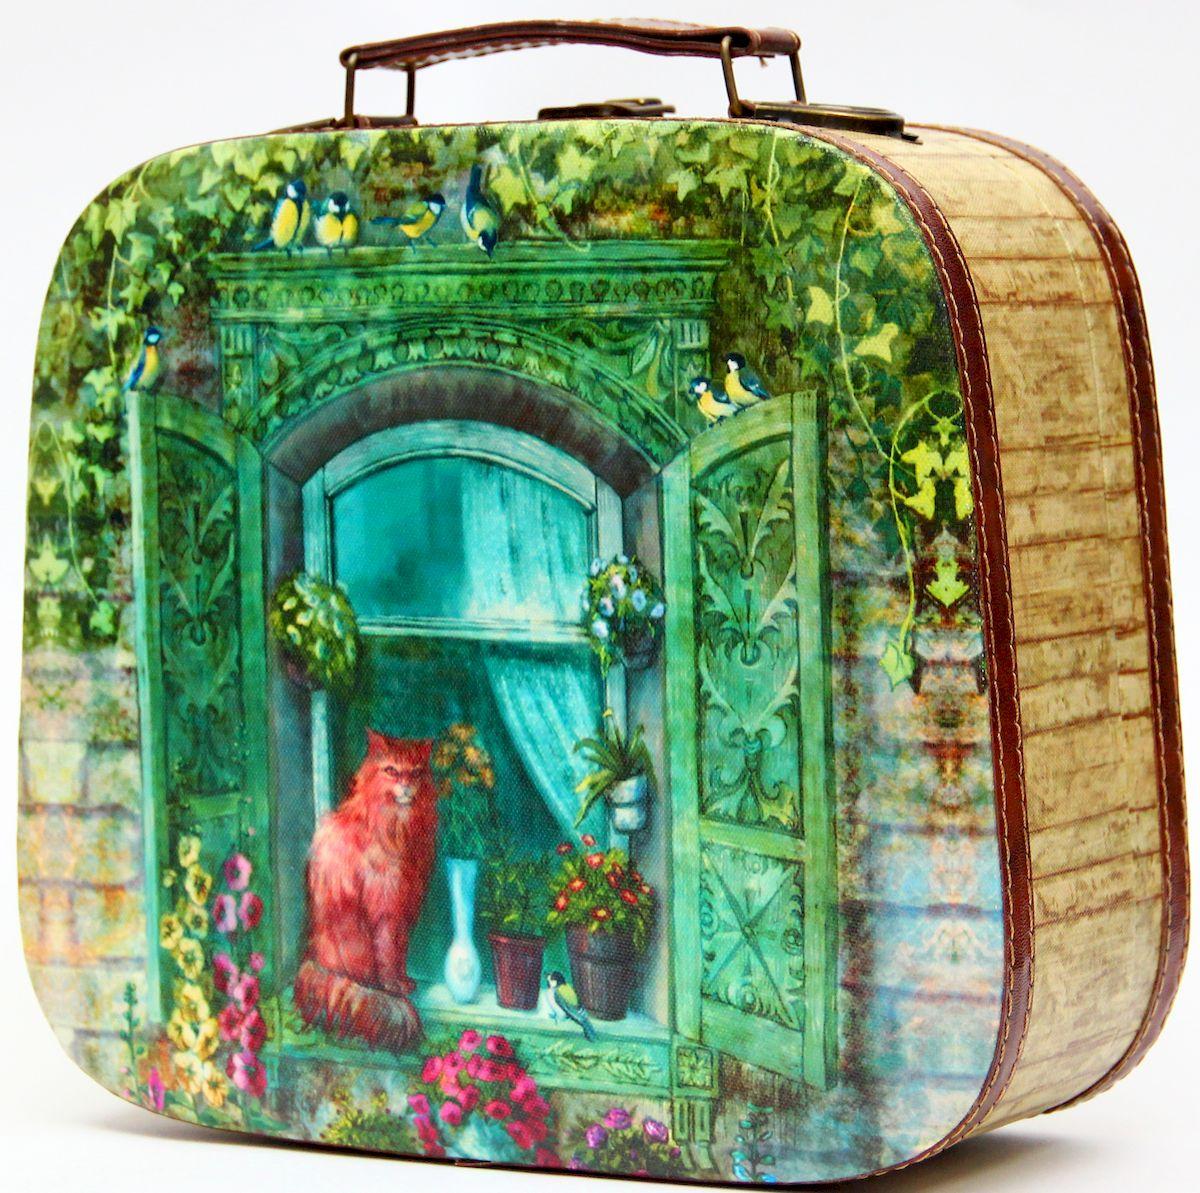 Шкатулка декоративная Magic Home Котик на окне, цвет: зеленый, 28,5 х 25 х 10,5 см шкатулка декоративная dg home 29х21 5х10 см dg d 786b